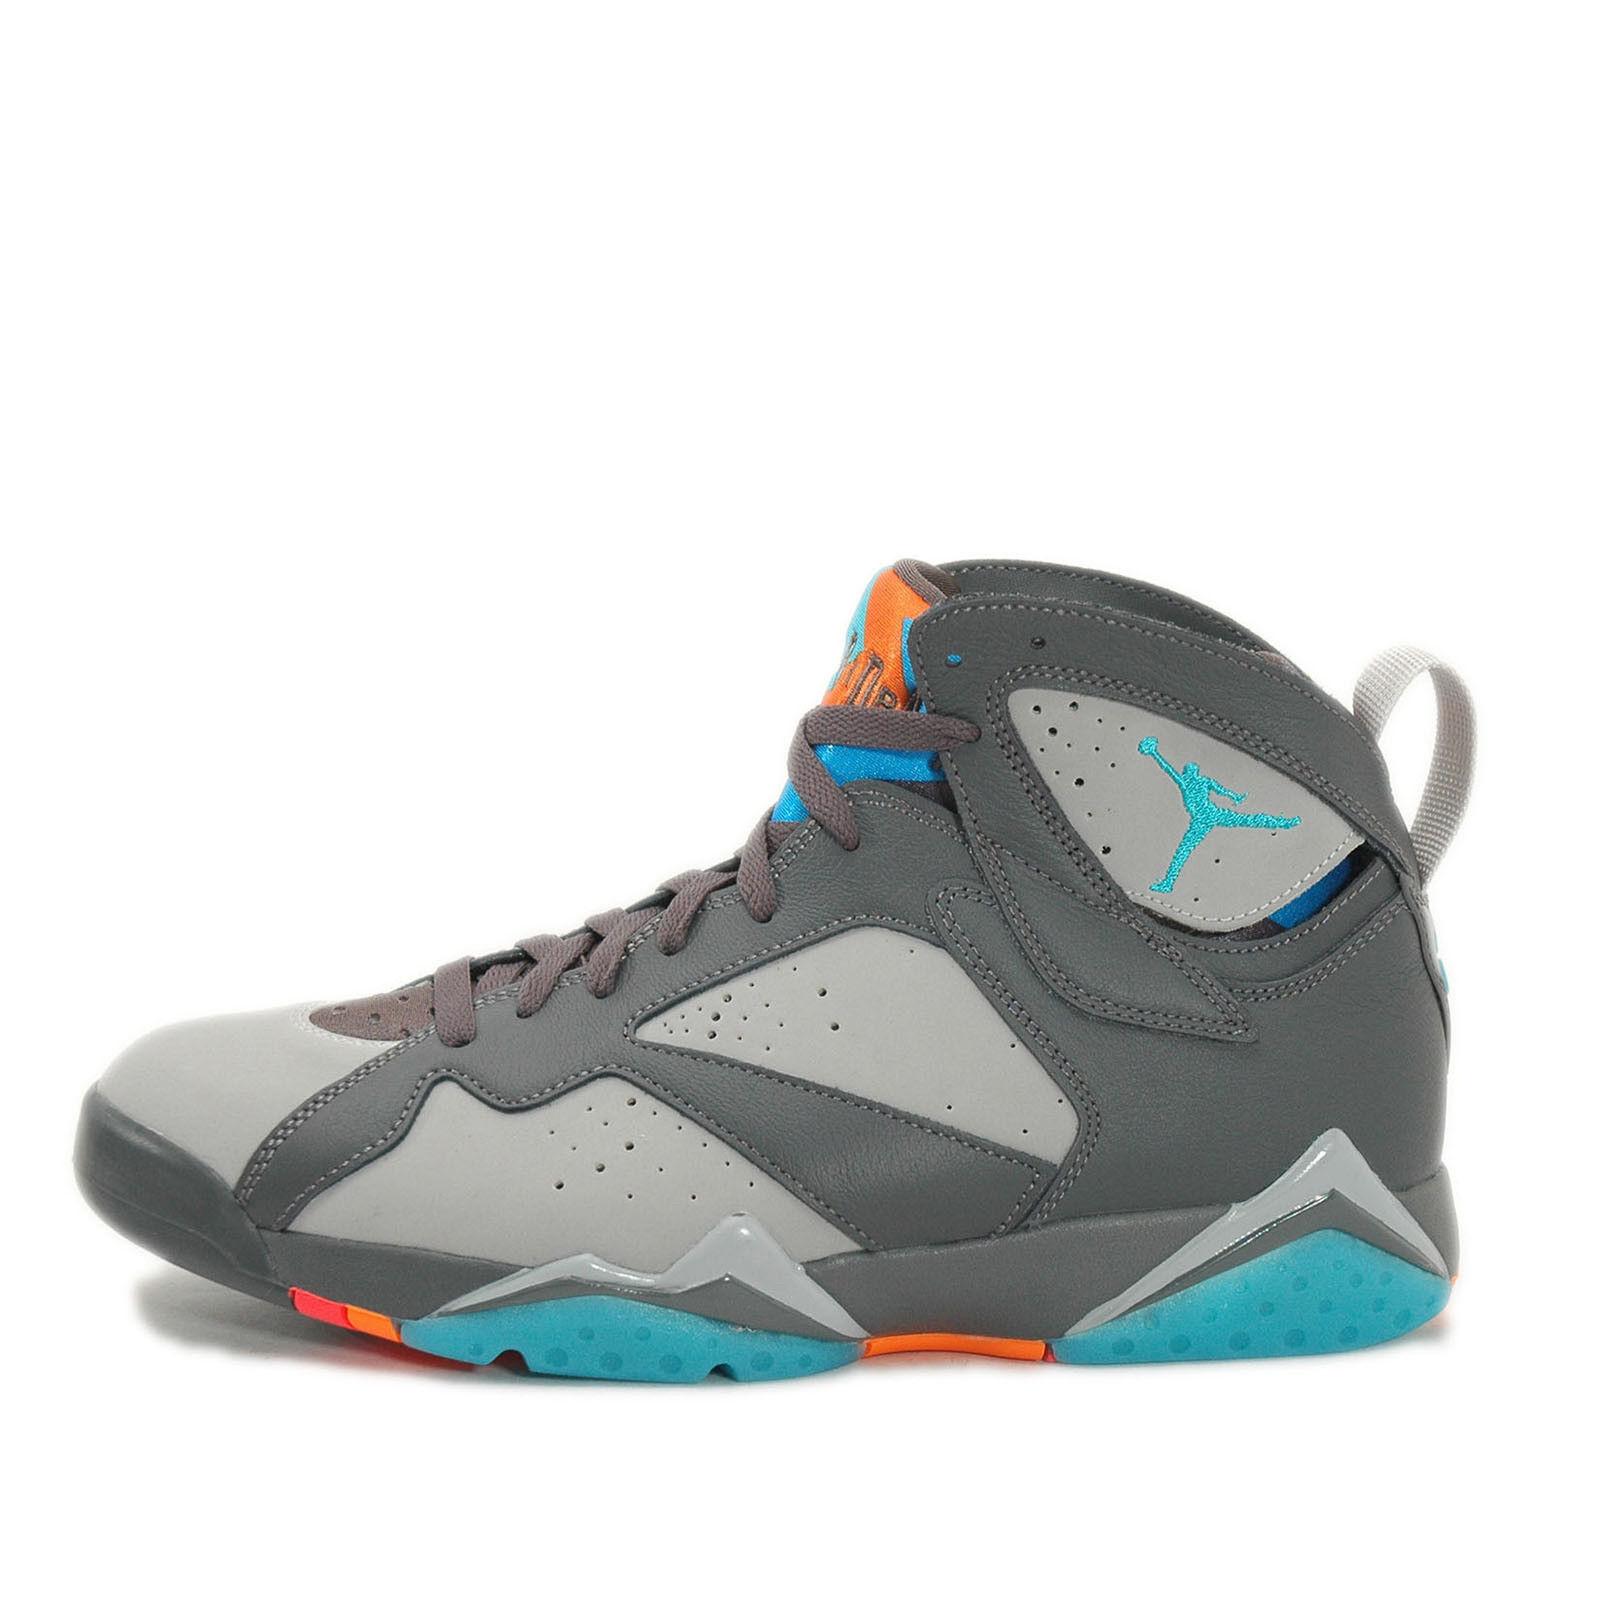 Nike air basket jordan 7 retrò uomini scarpe da basket air barcellona giorni noi 9,5 f1d3a5